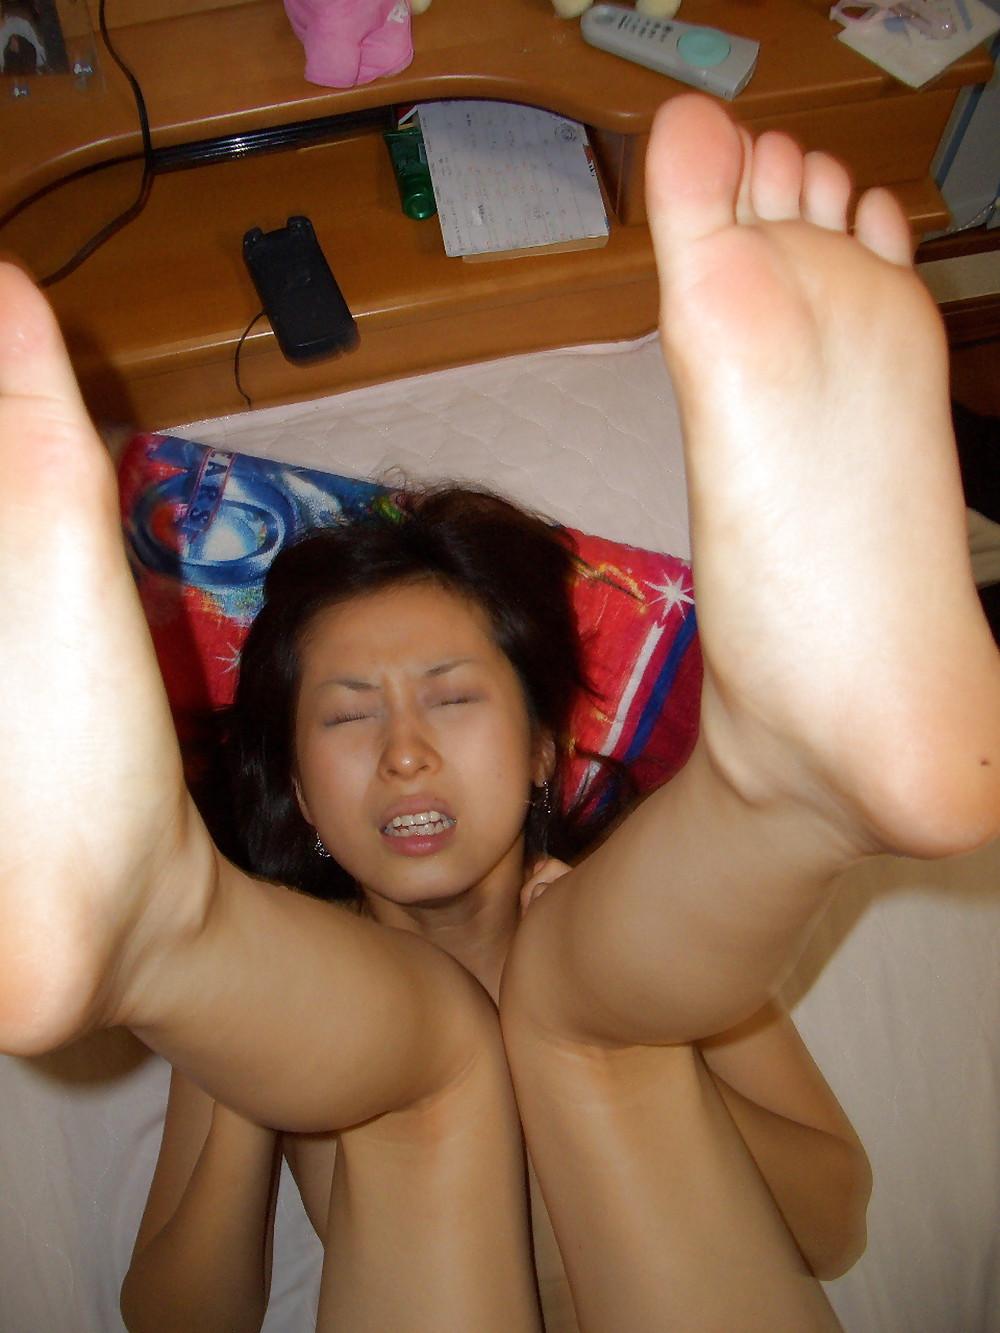 gilbert-nude-amatuer-japanese-jailbait-nude-tit-daughter-china